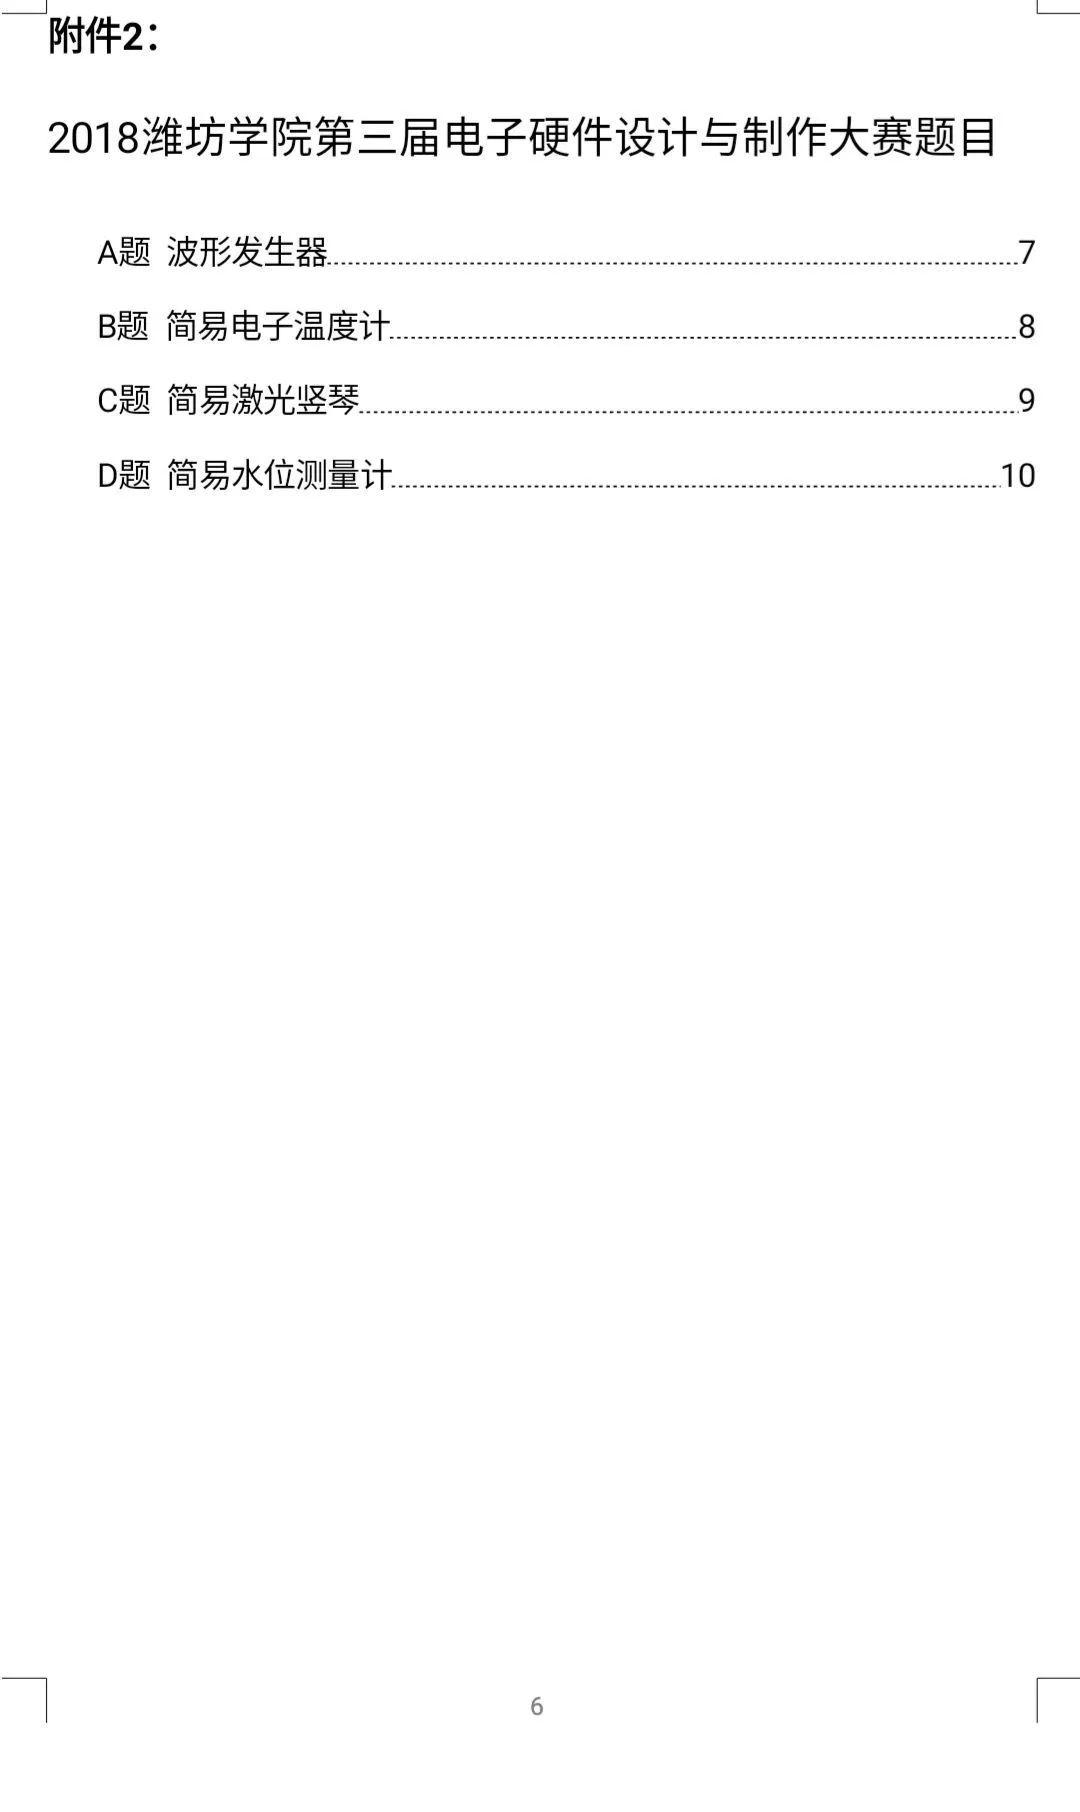 ea18af5bb34c8c48451ed5cc5f2ddc48.png